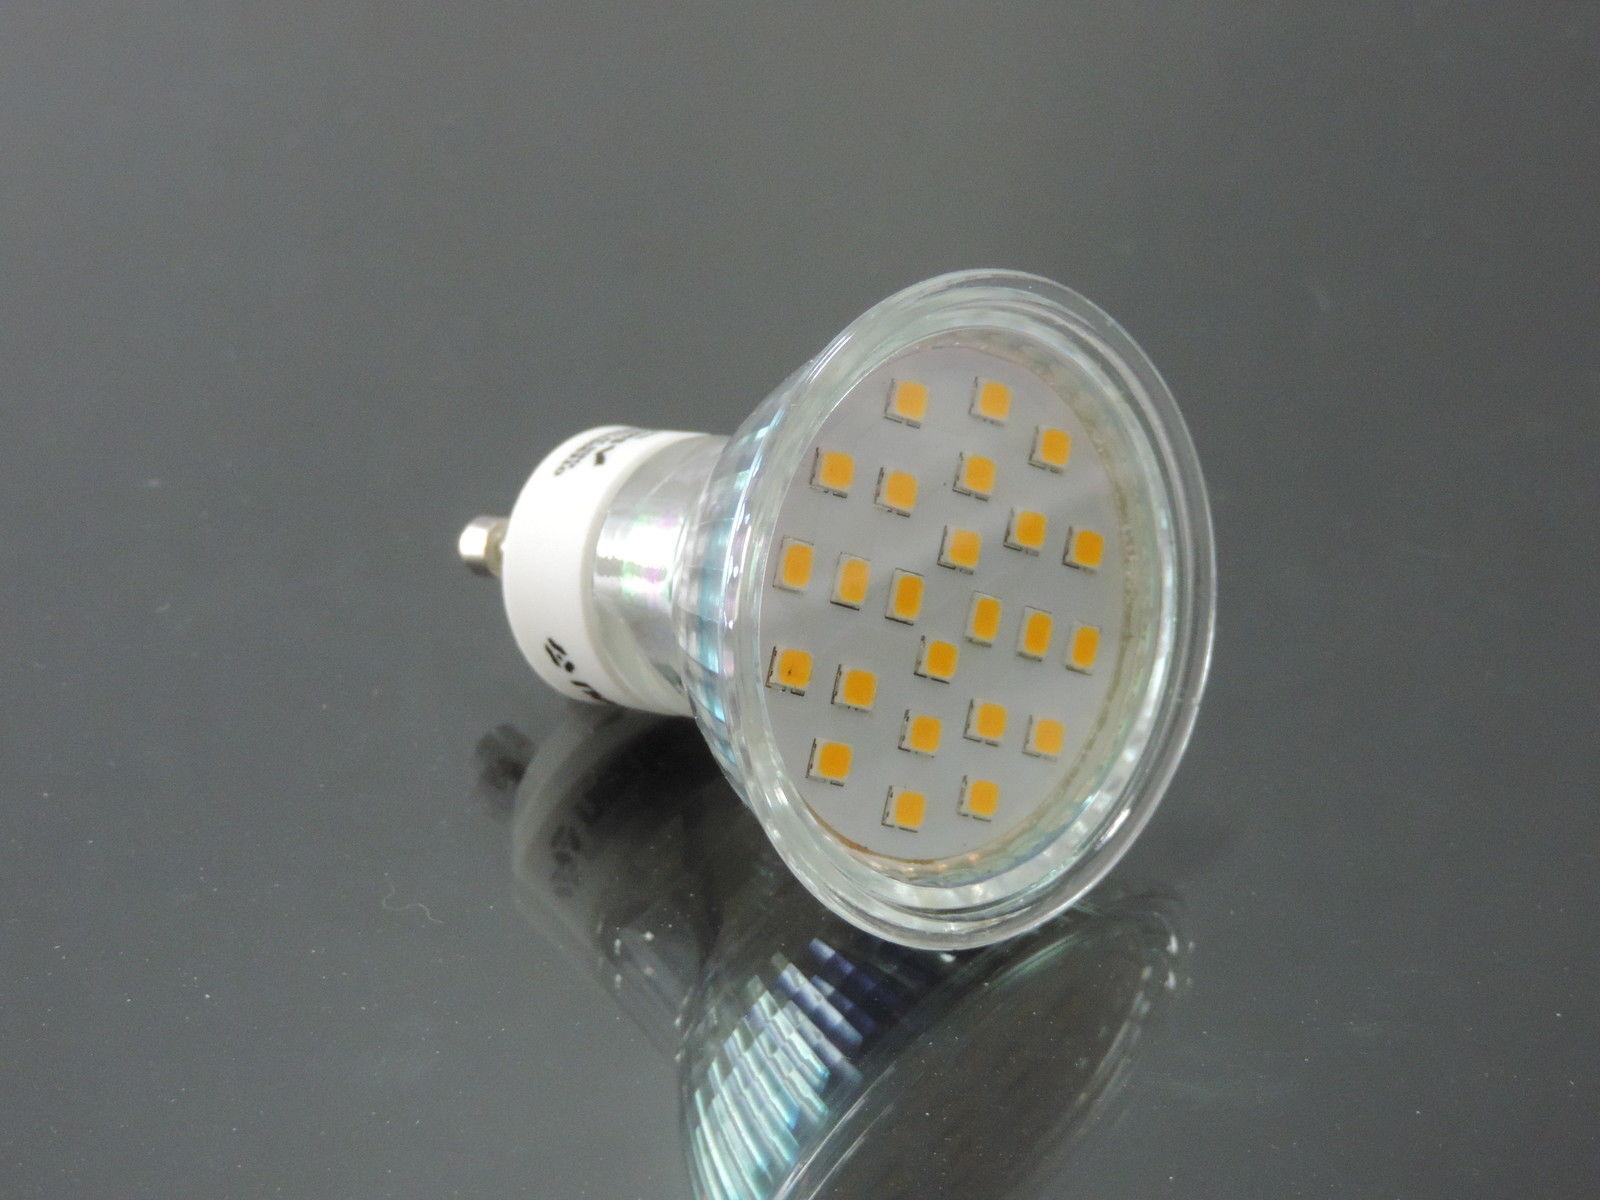 10x LED Spot superhelle GU10 Leuchtmittel warmweiss 24x2835 Schutzglas   11896